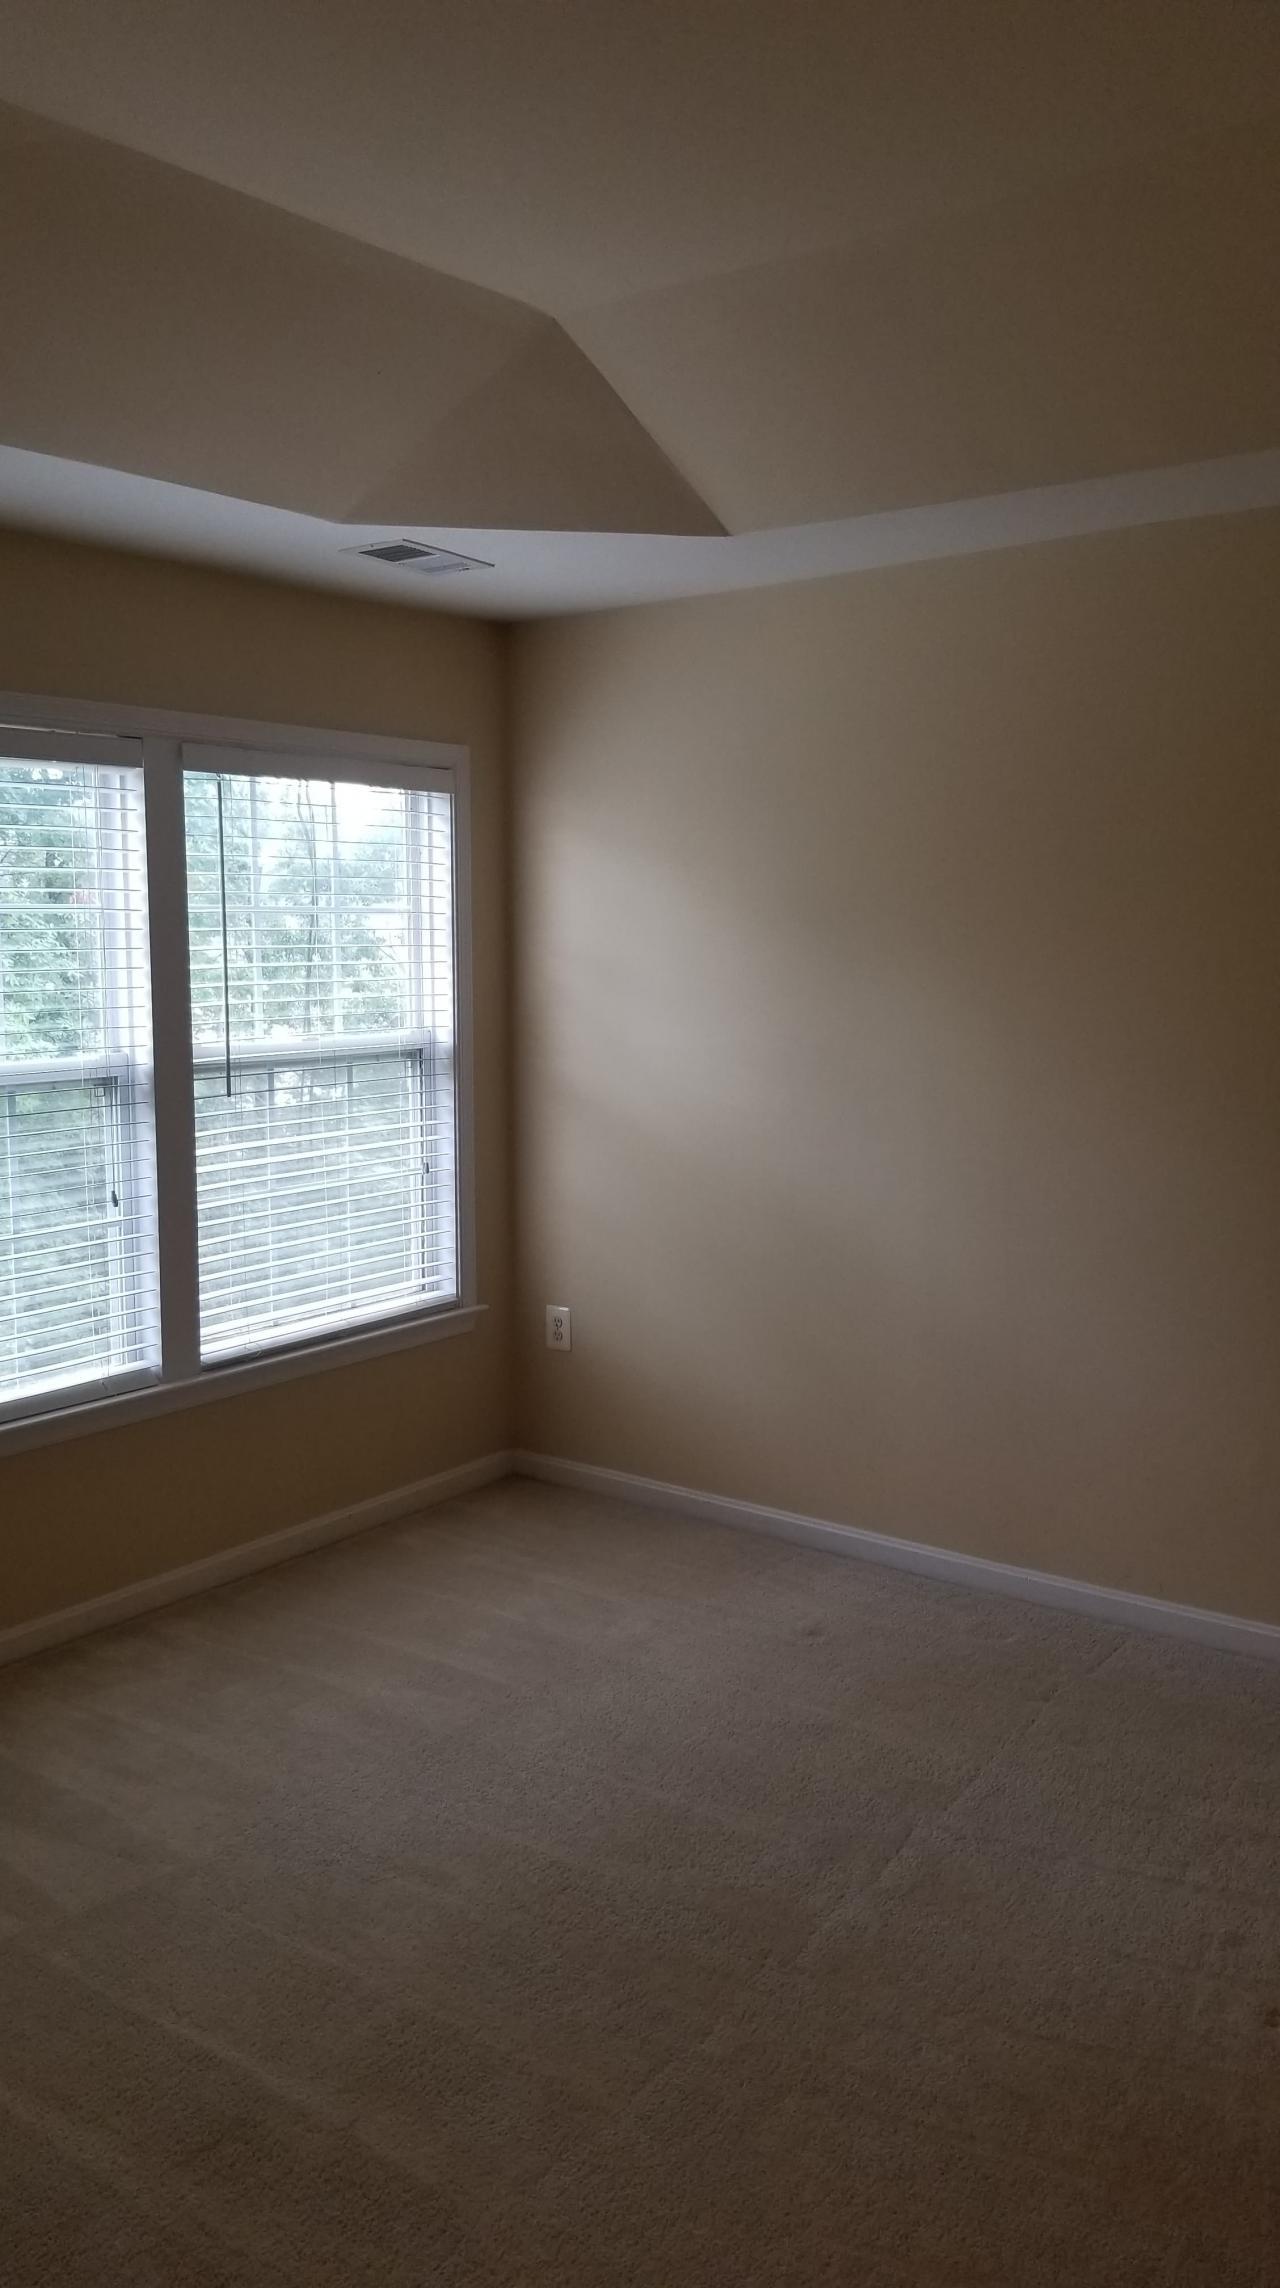 ABUNDANT WINDOWS IN EVERY ROOM